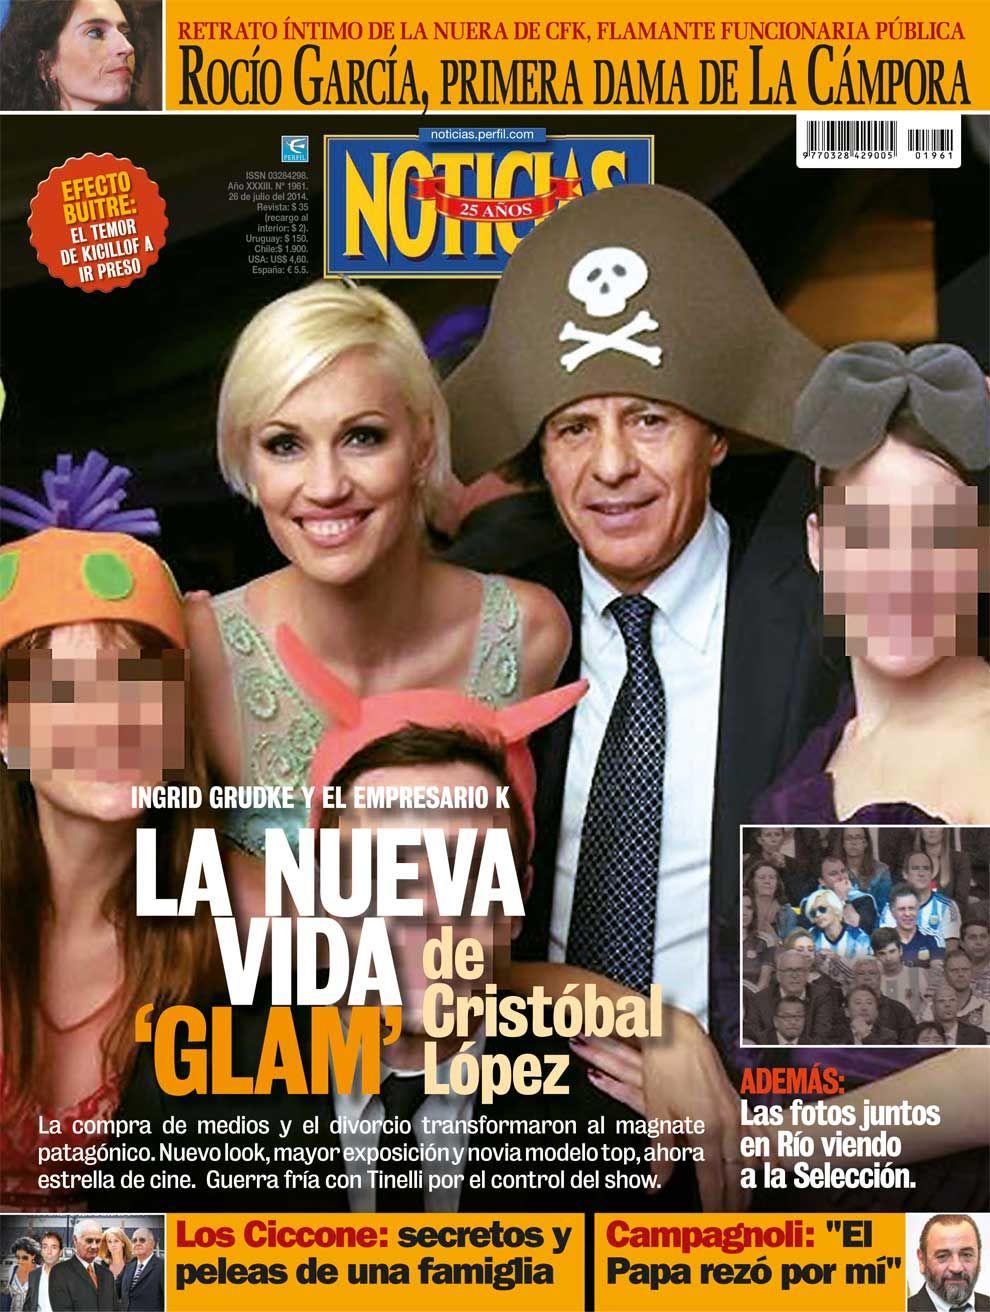 La nueva vida 'glam' de Cristóbal López